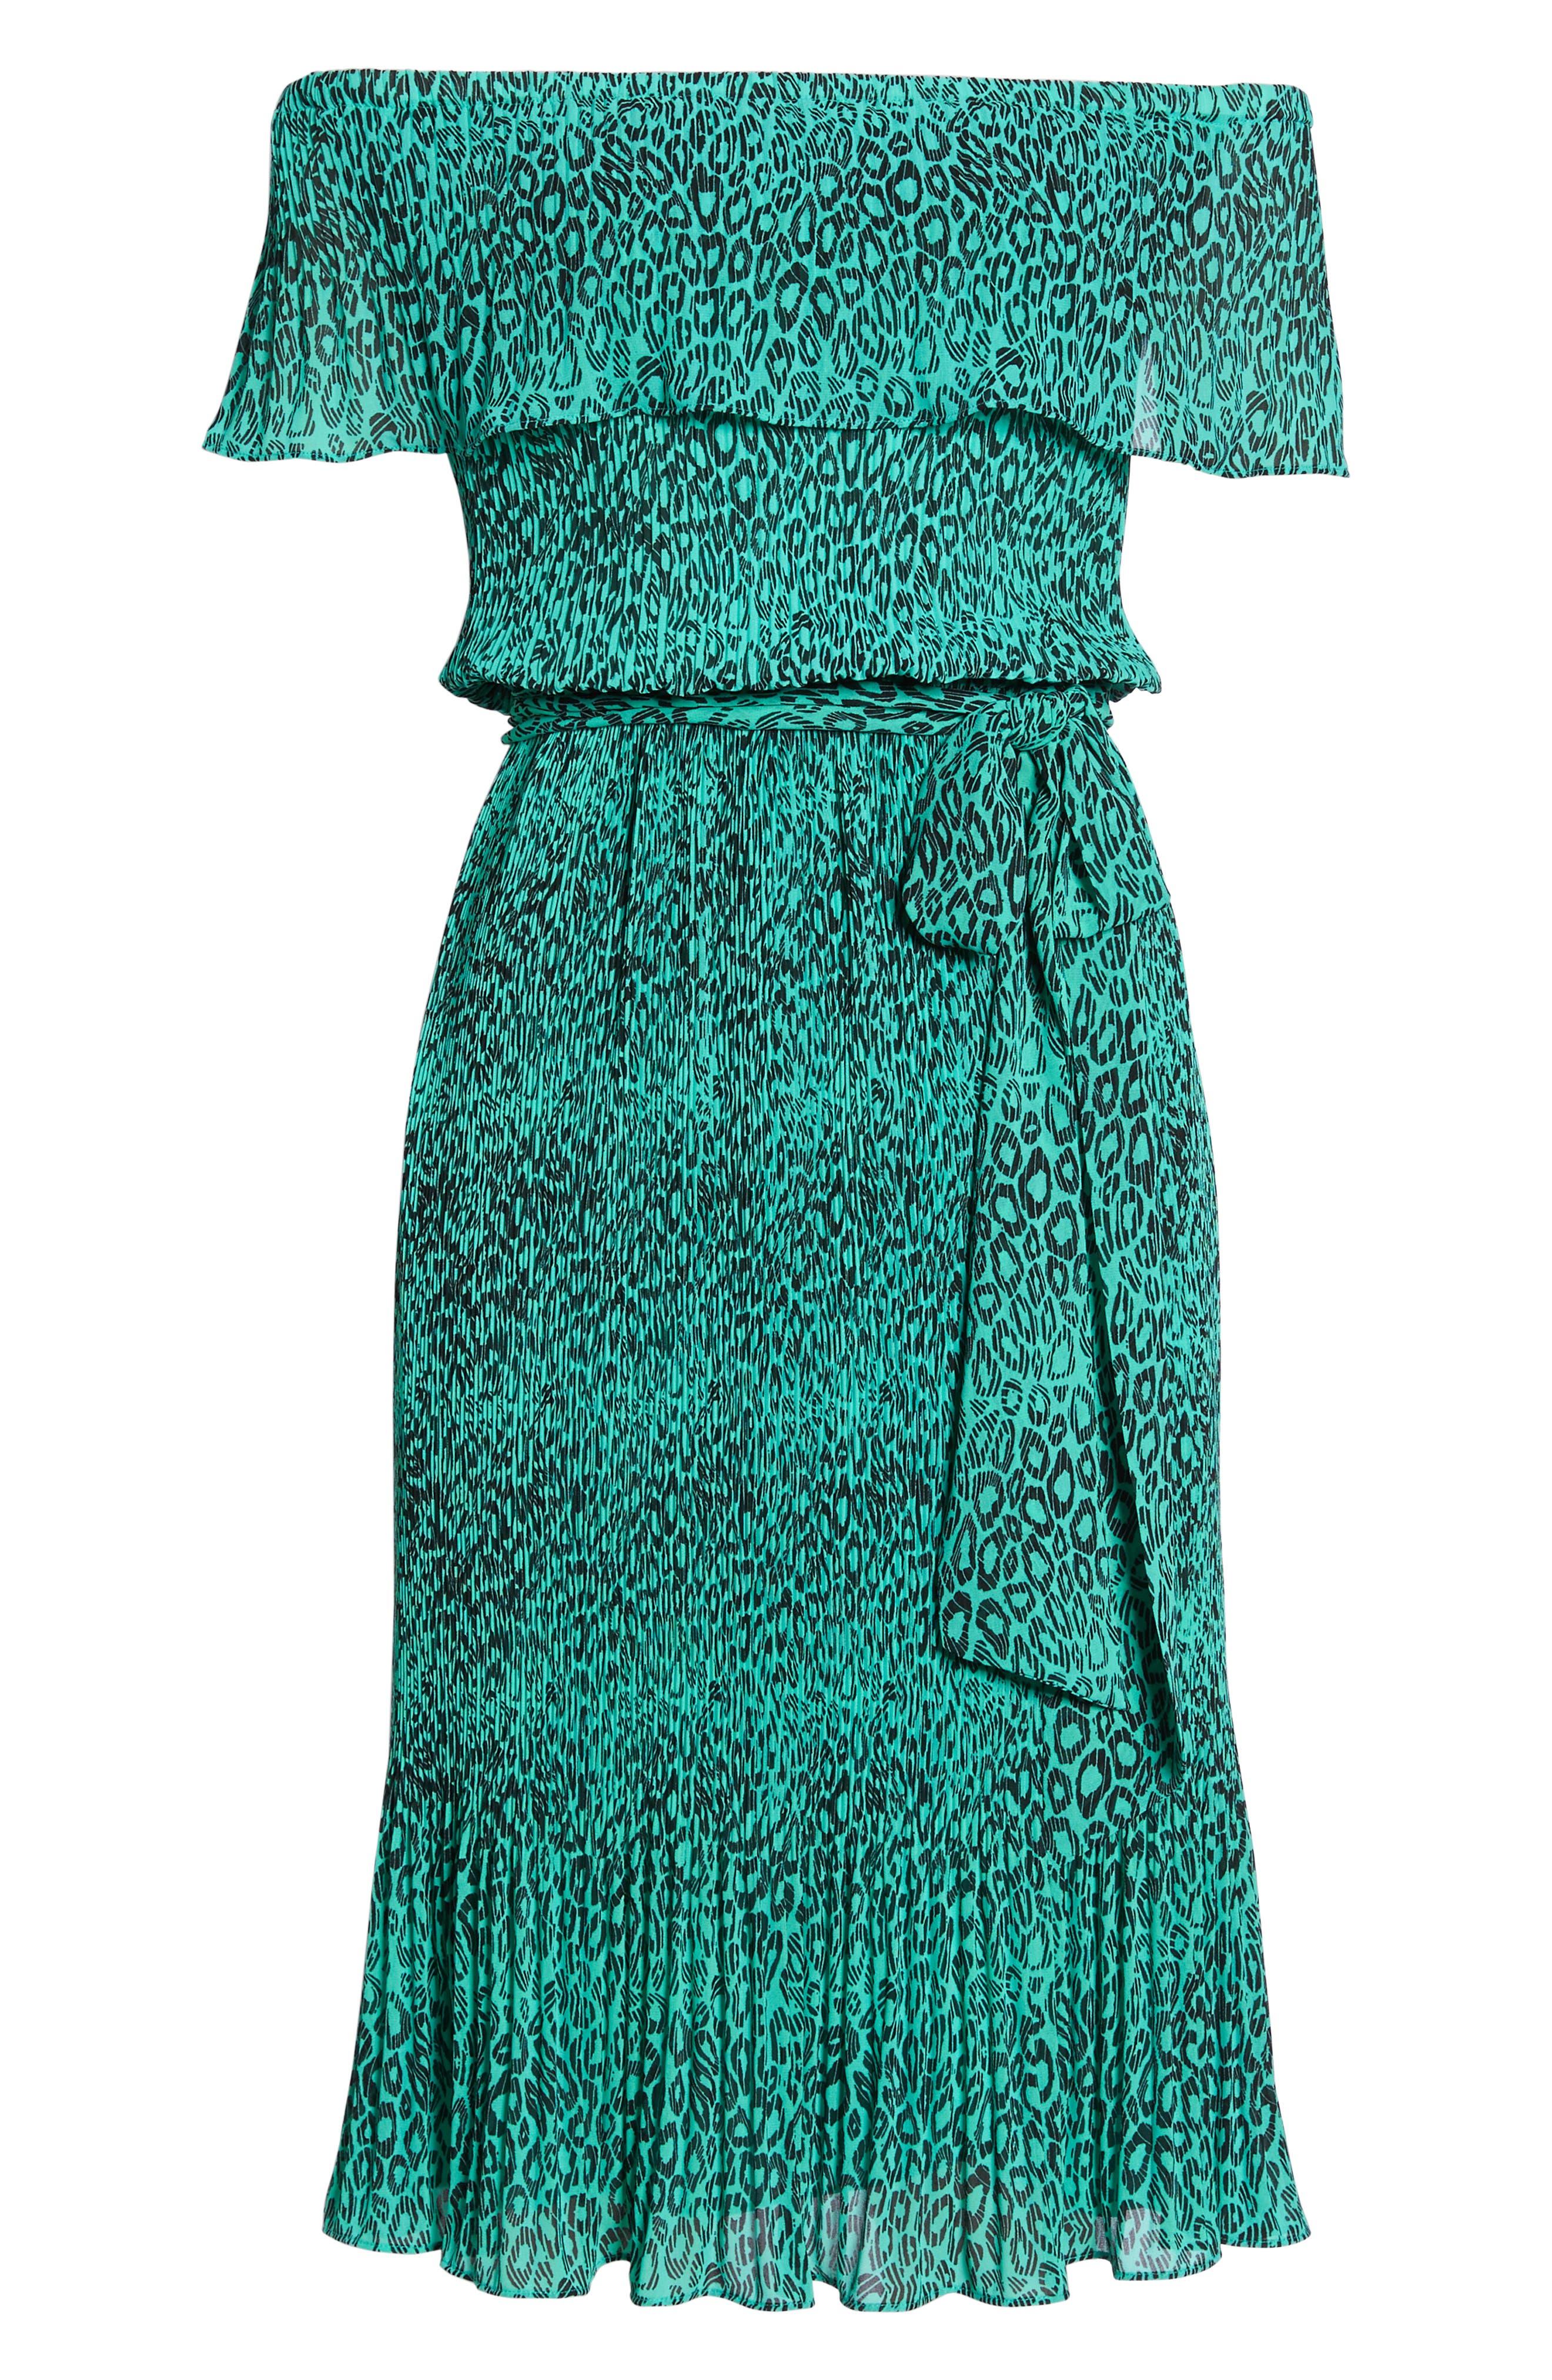 Off the Shoulder Chiffon Midi Dress,                             Alternate thumbnail 7, color,                             300